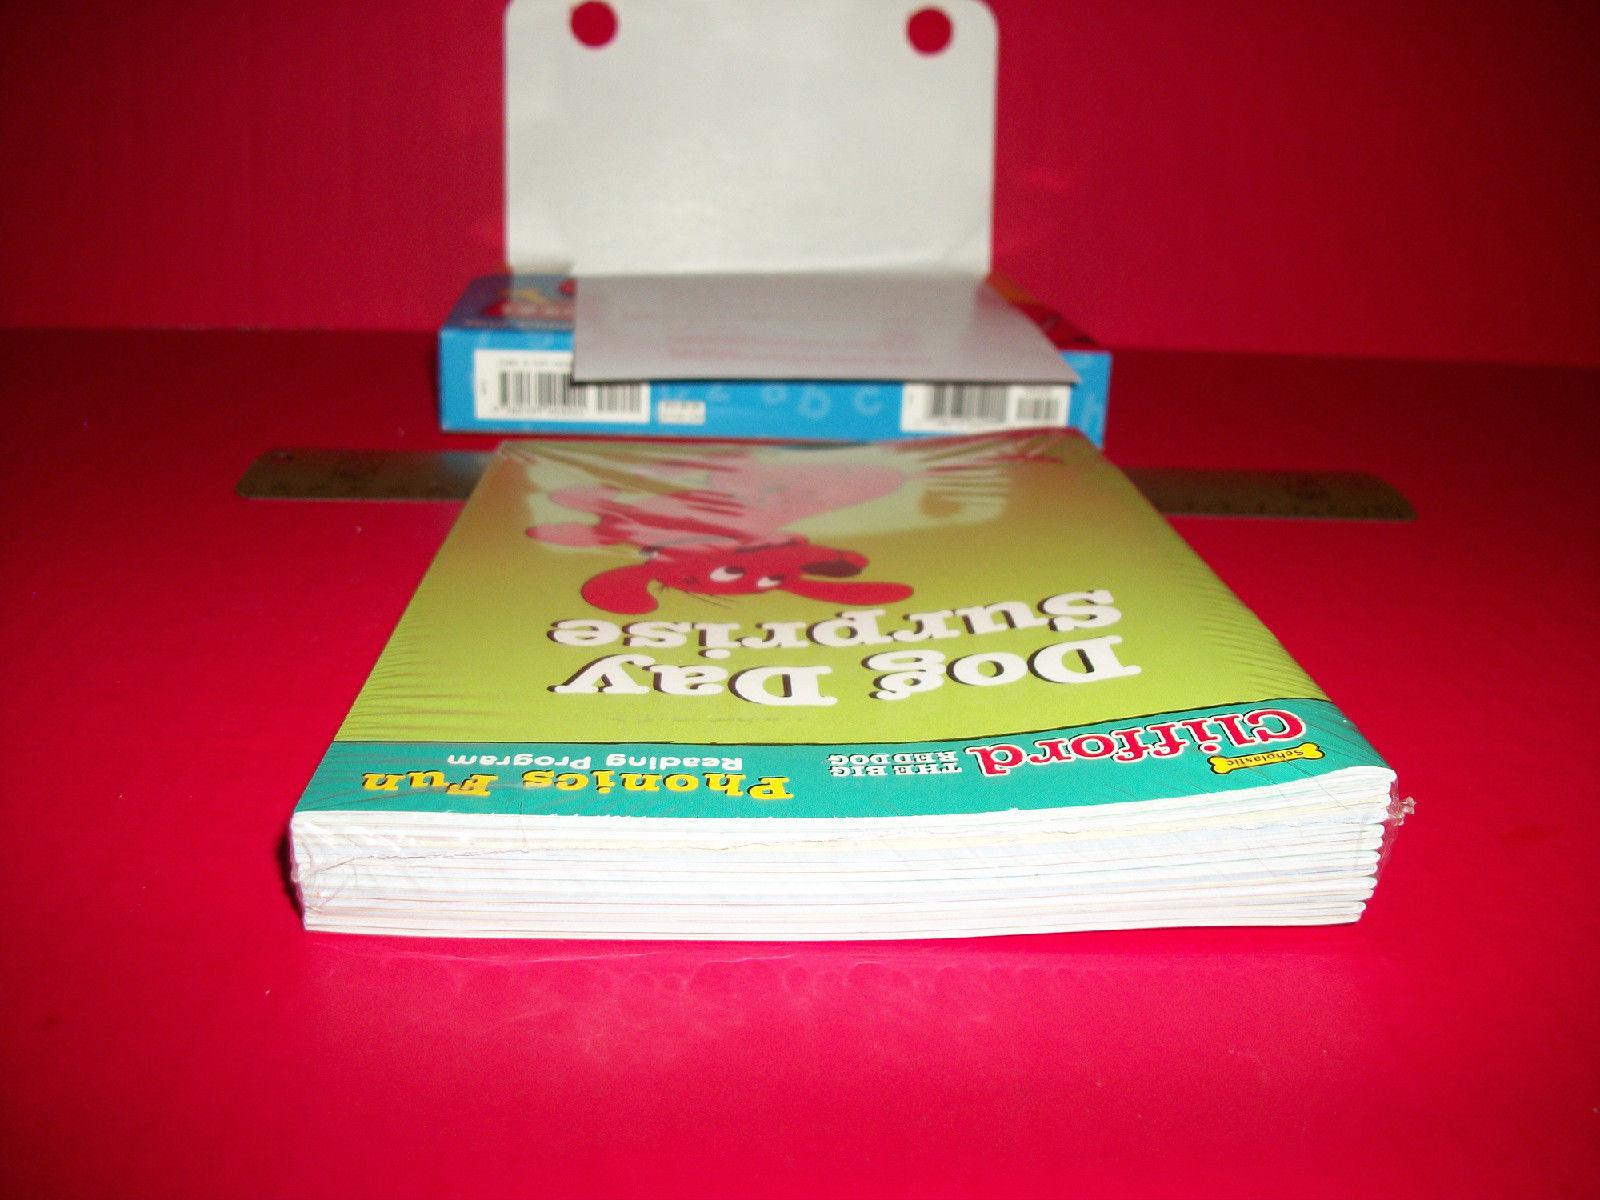 Clifford Big Red Dog Phonics Fun Set Scholastic Book Reading Education Program